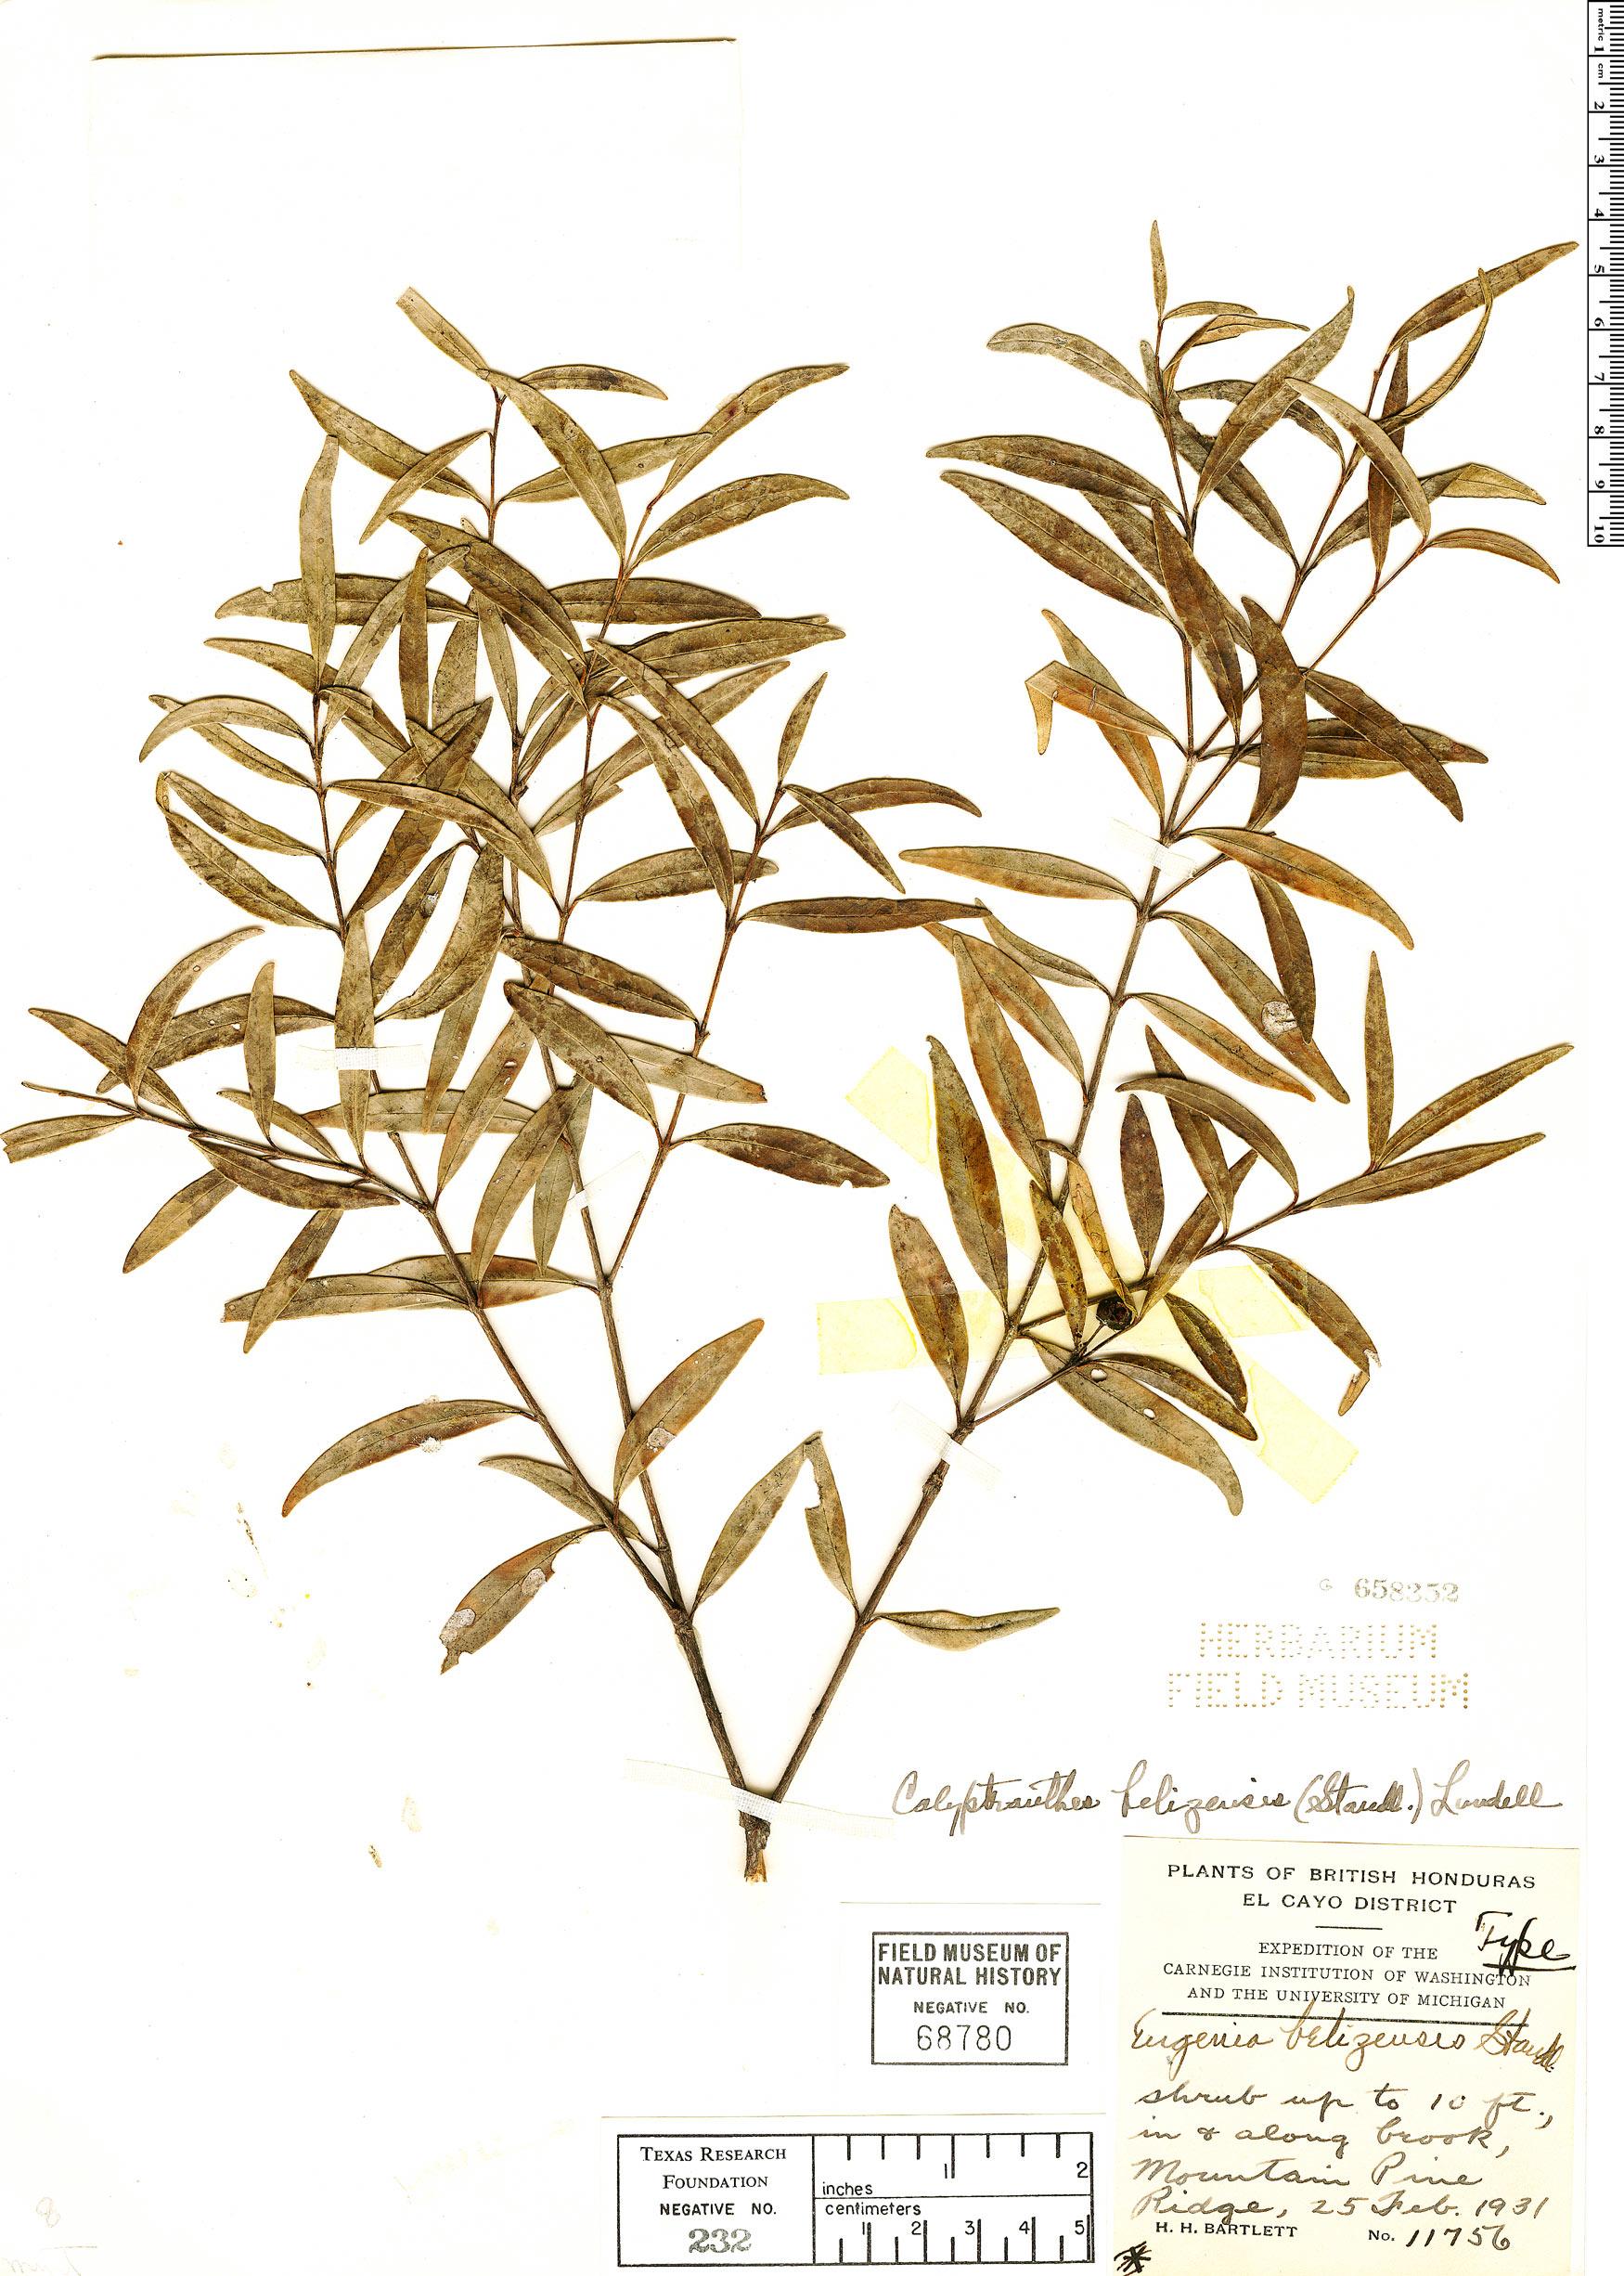 Specimen: Calyptranthes hondurensis